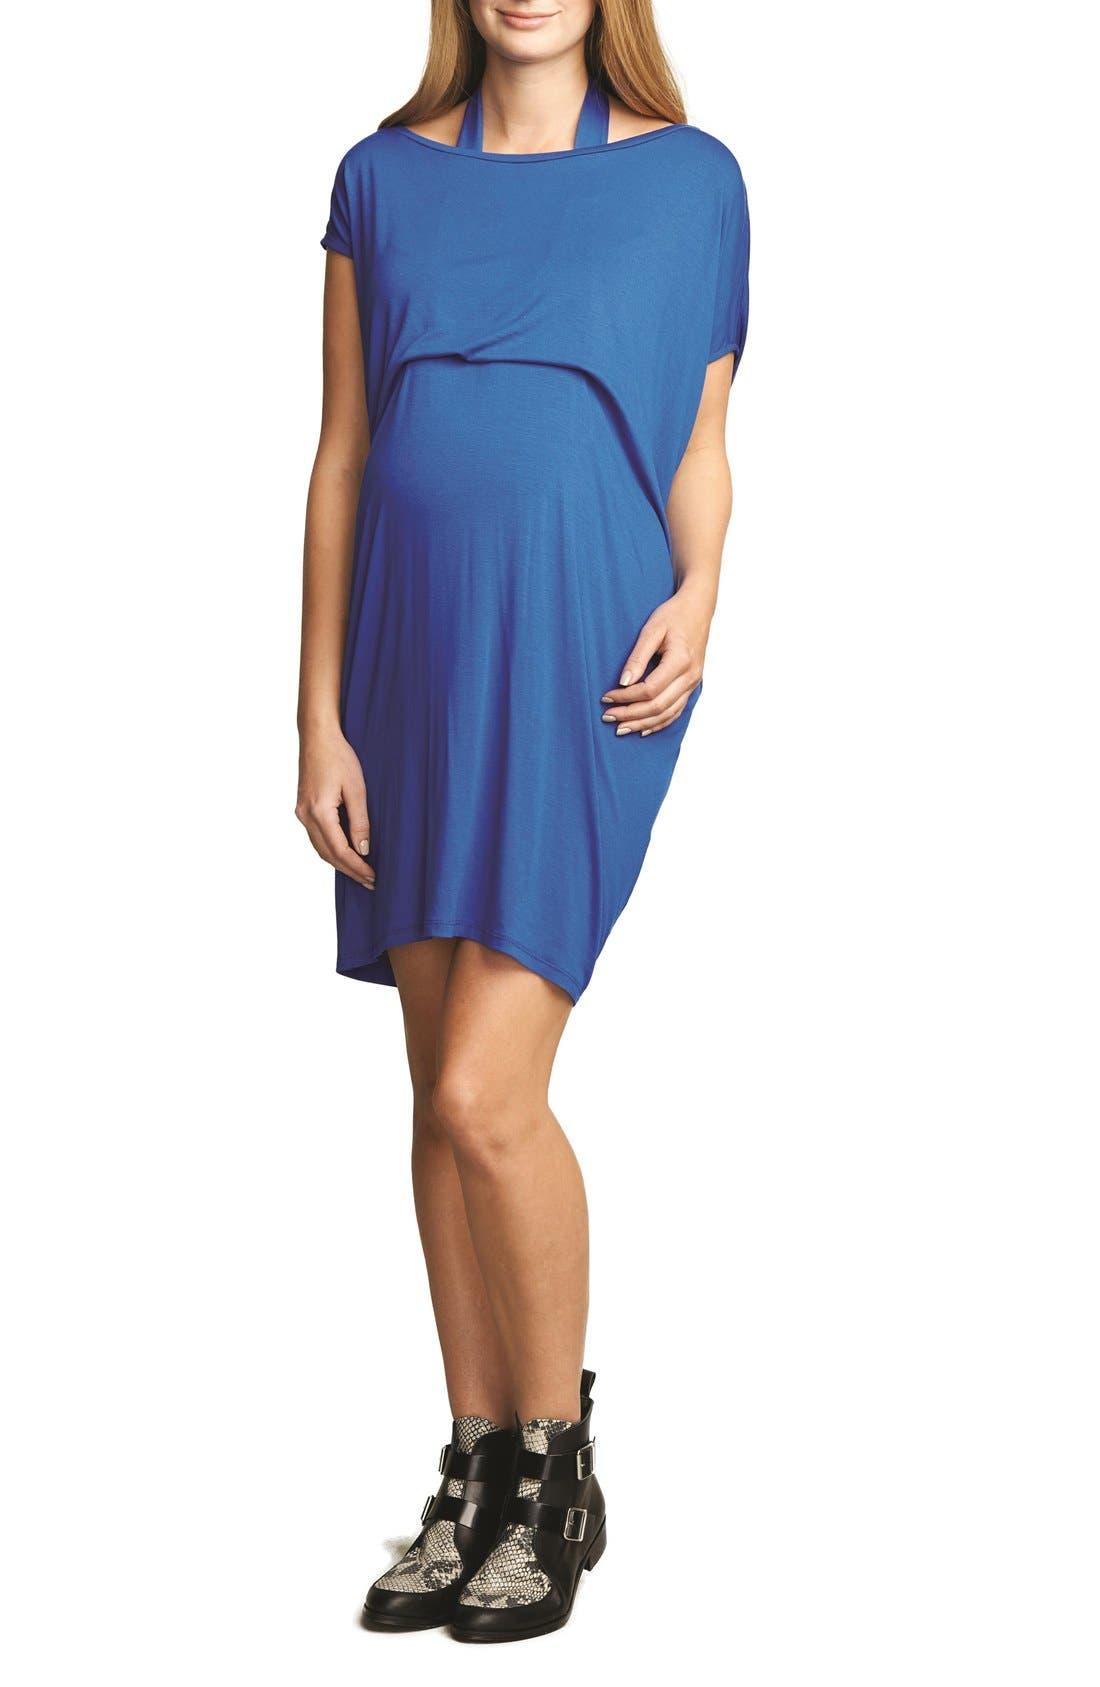 The Urban Ma Halter Maternity Dress